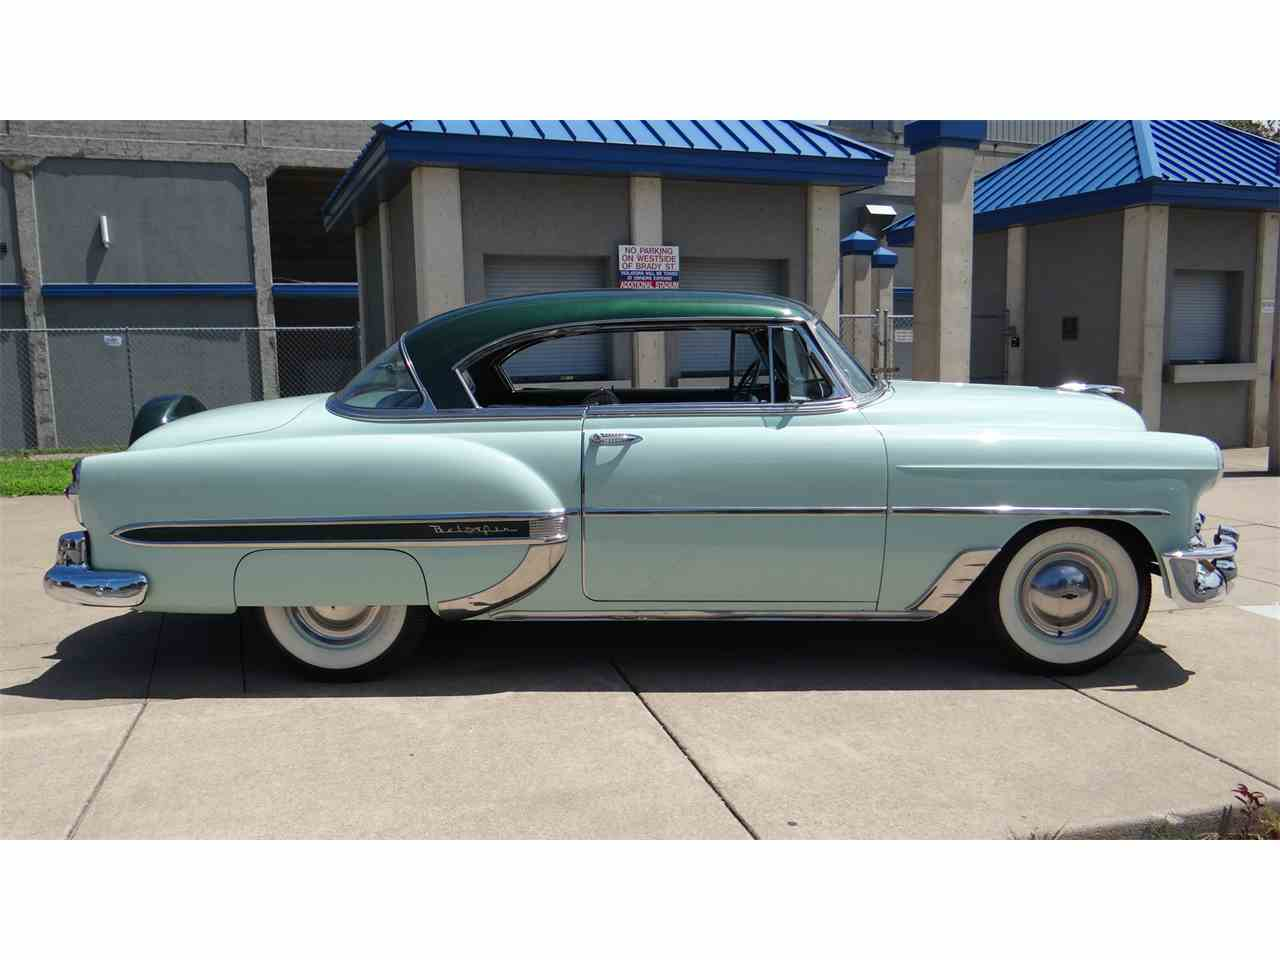 Classic Cars For Sale In Davenport Iowa